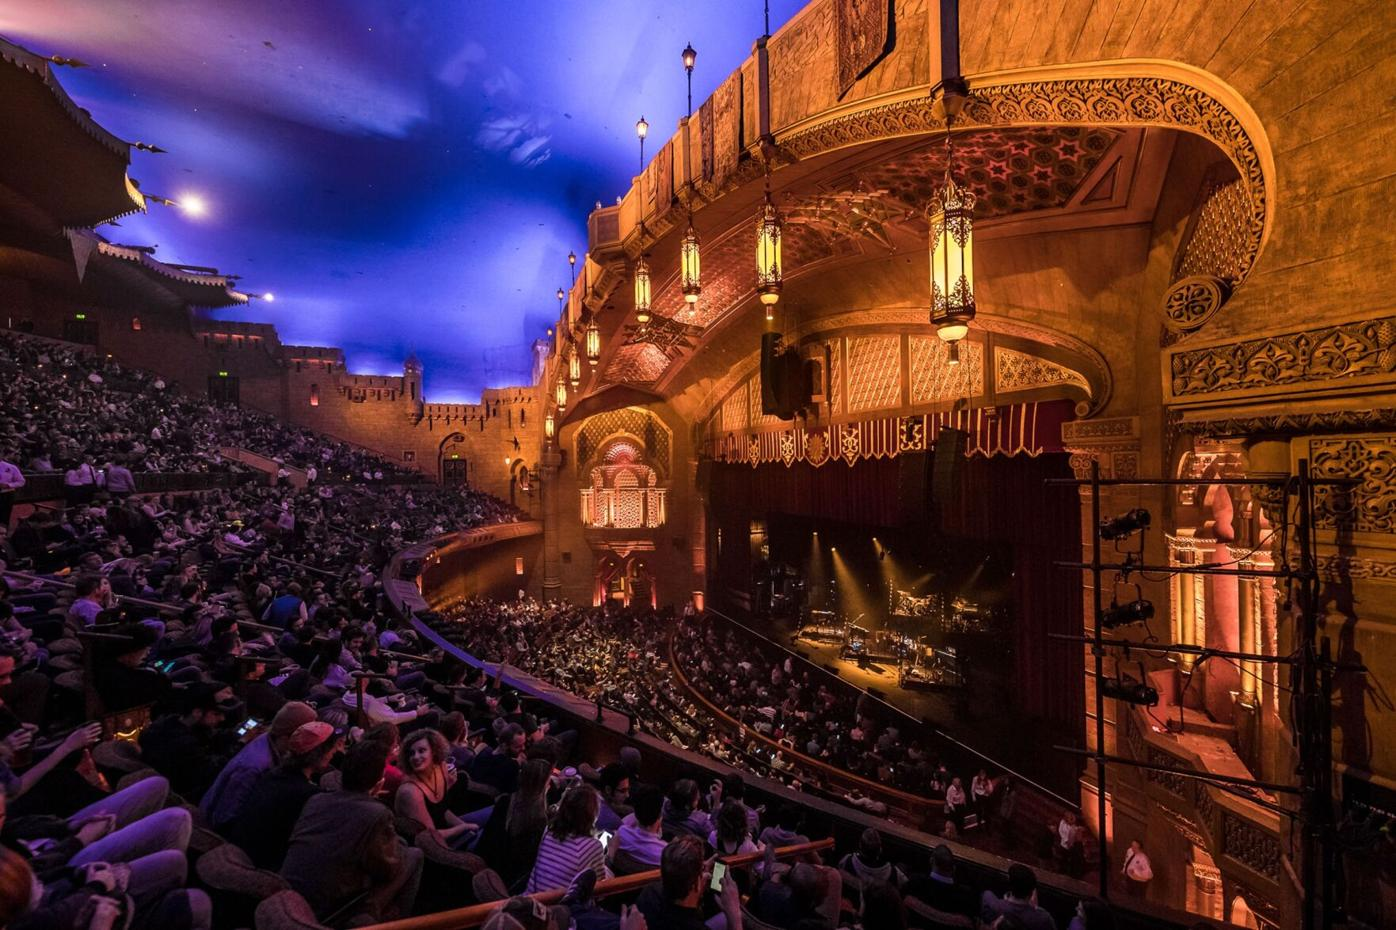 040721_MNS_arts_rescue_002 Fox Theatre interior with fans